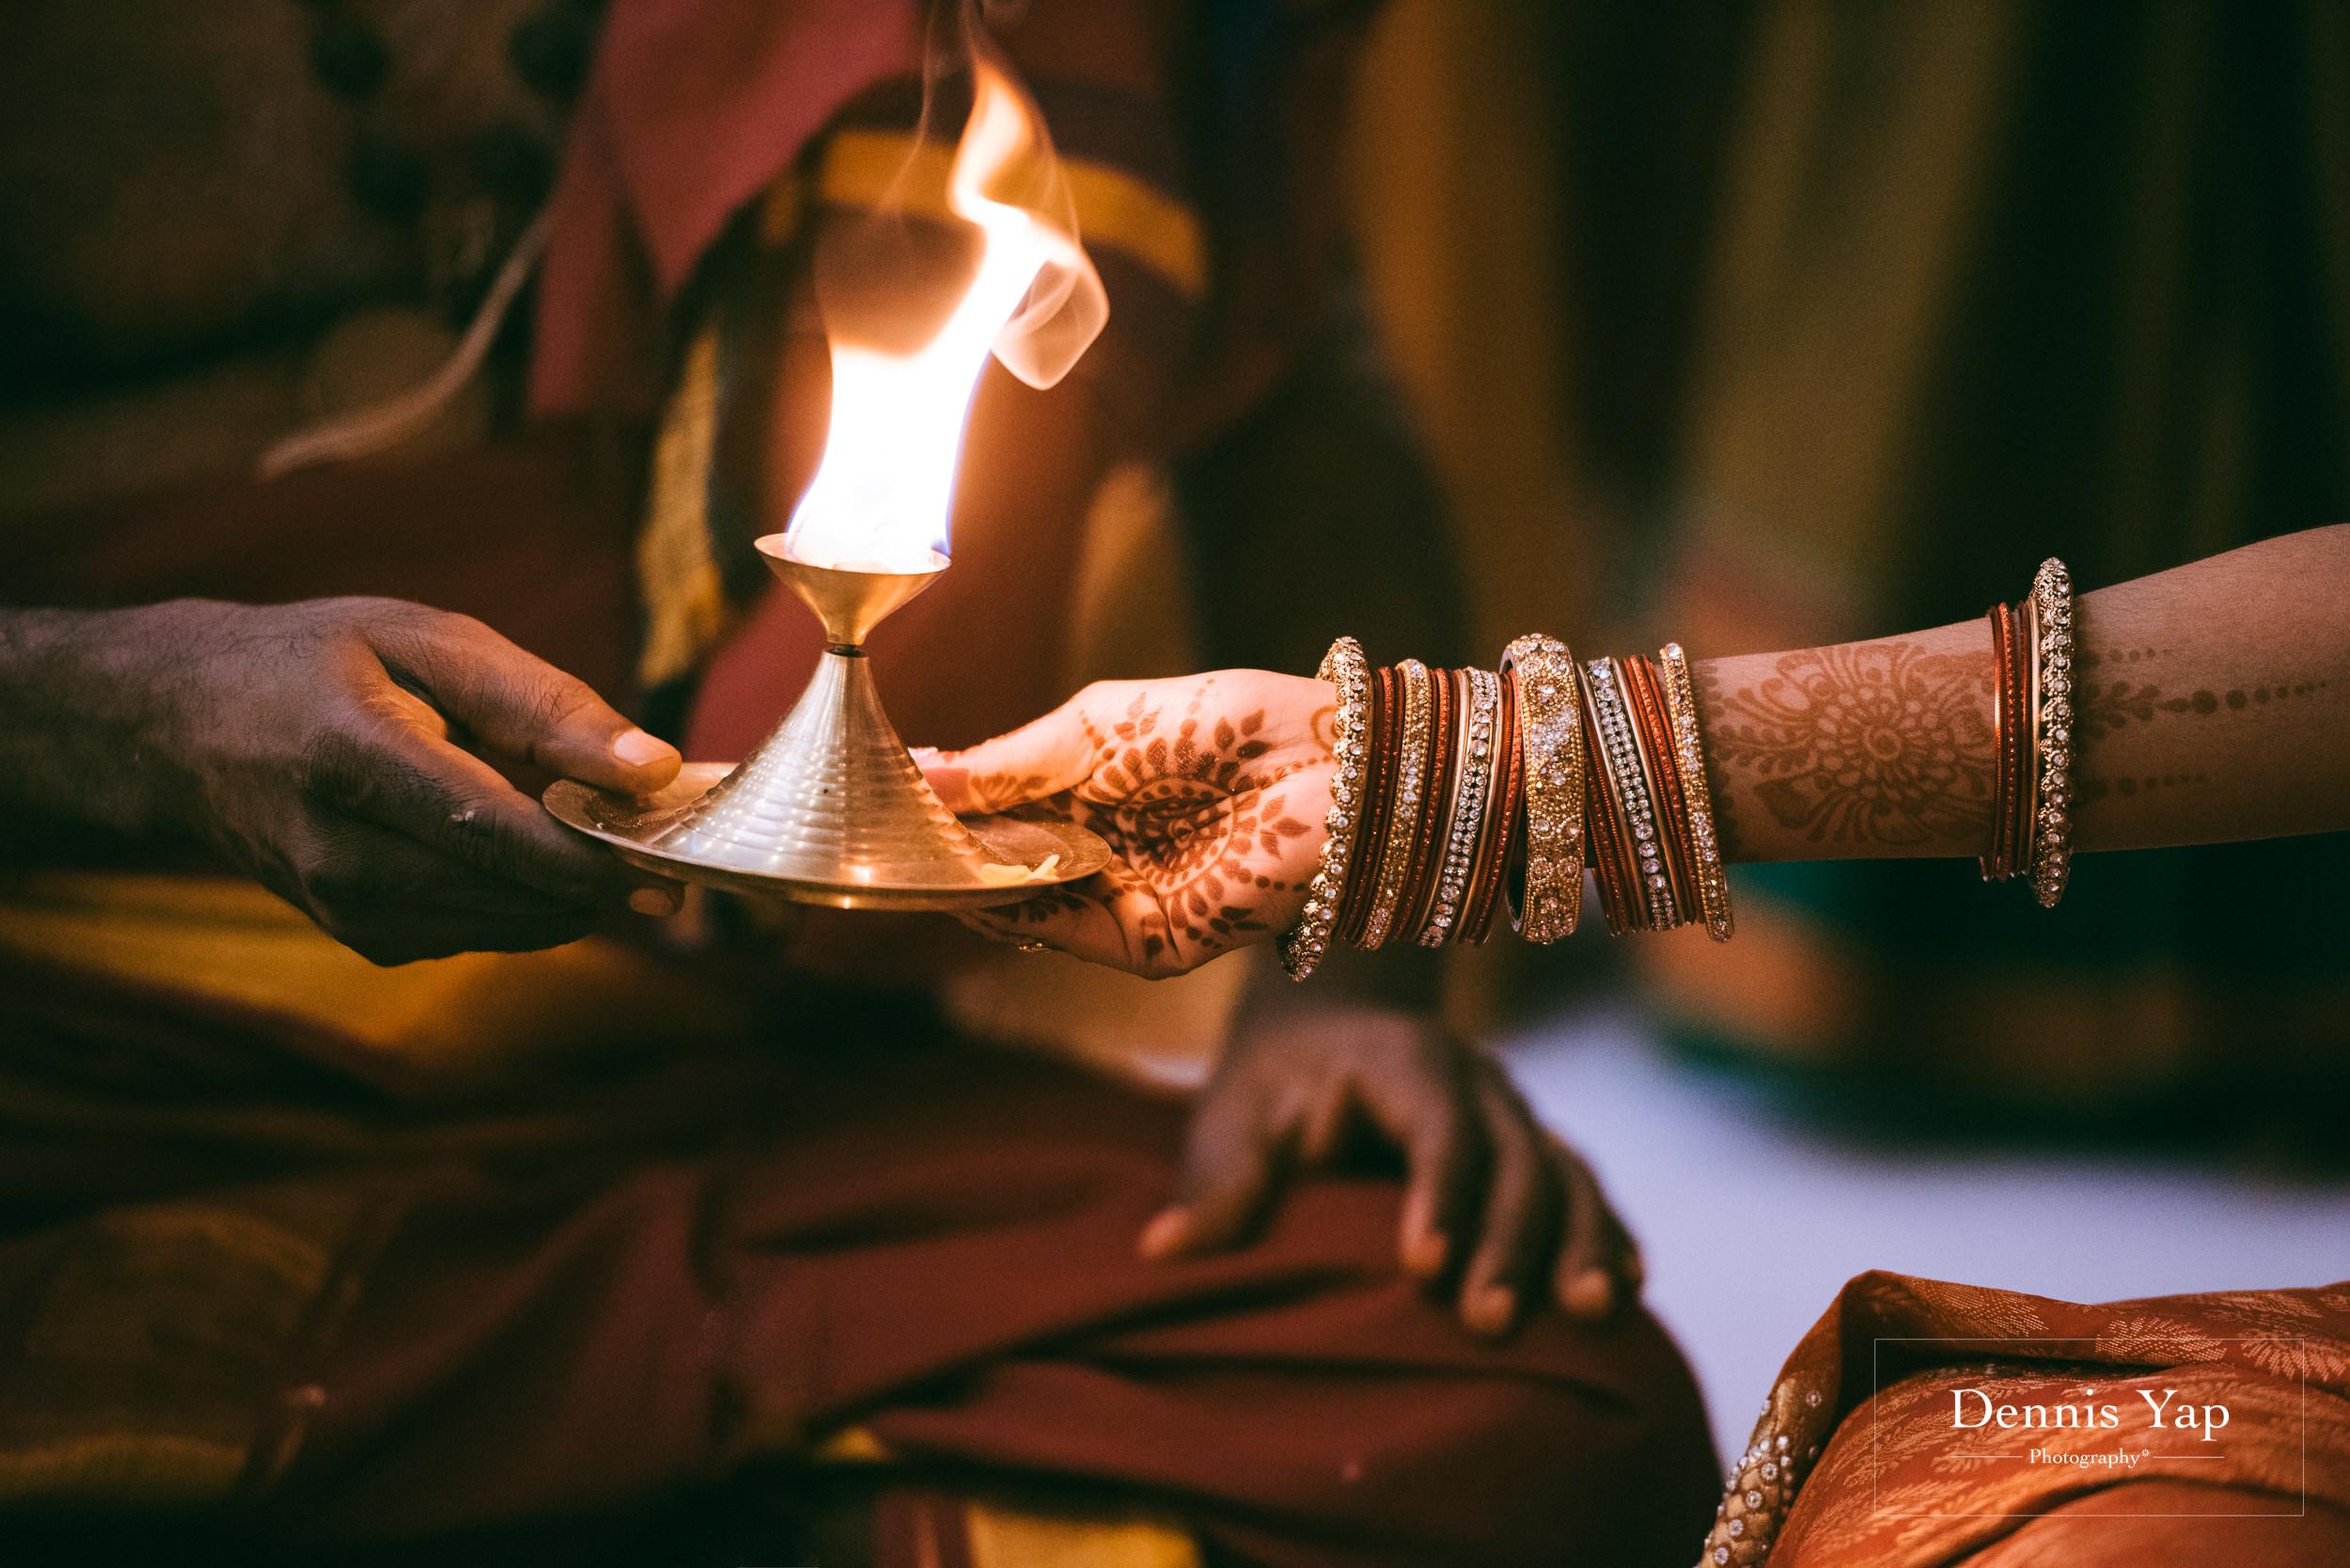 puvaneswaran cangitaa indian wedding ceremony ideal convention dennis yap photography malaysia-18.jpg